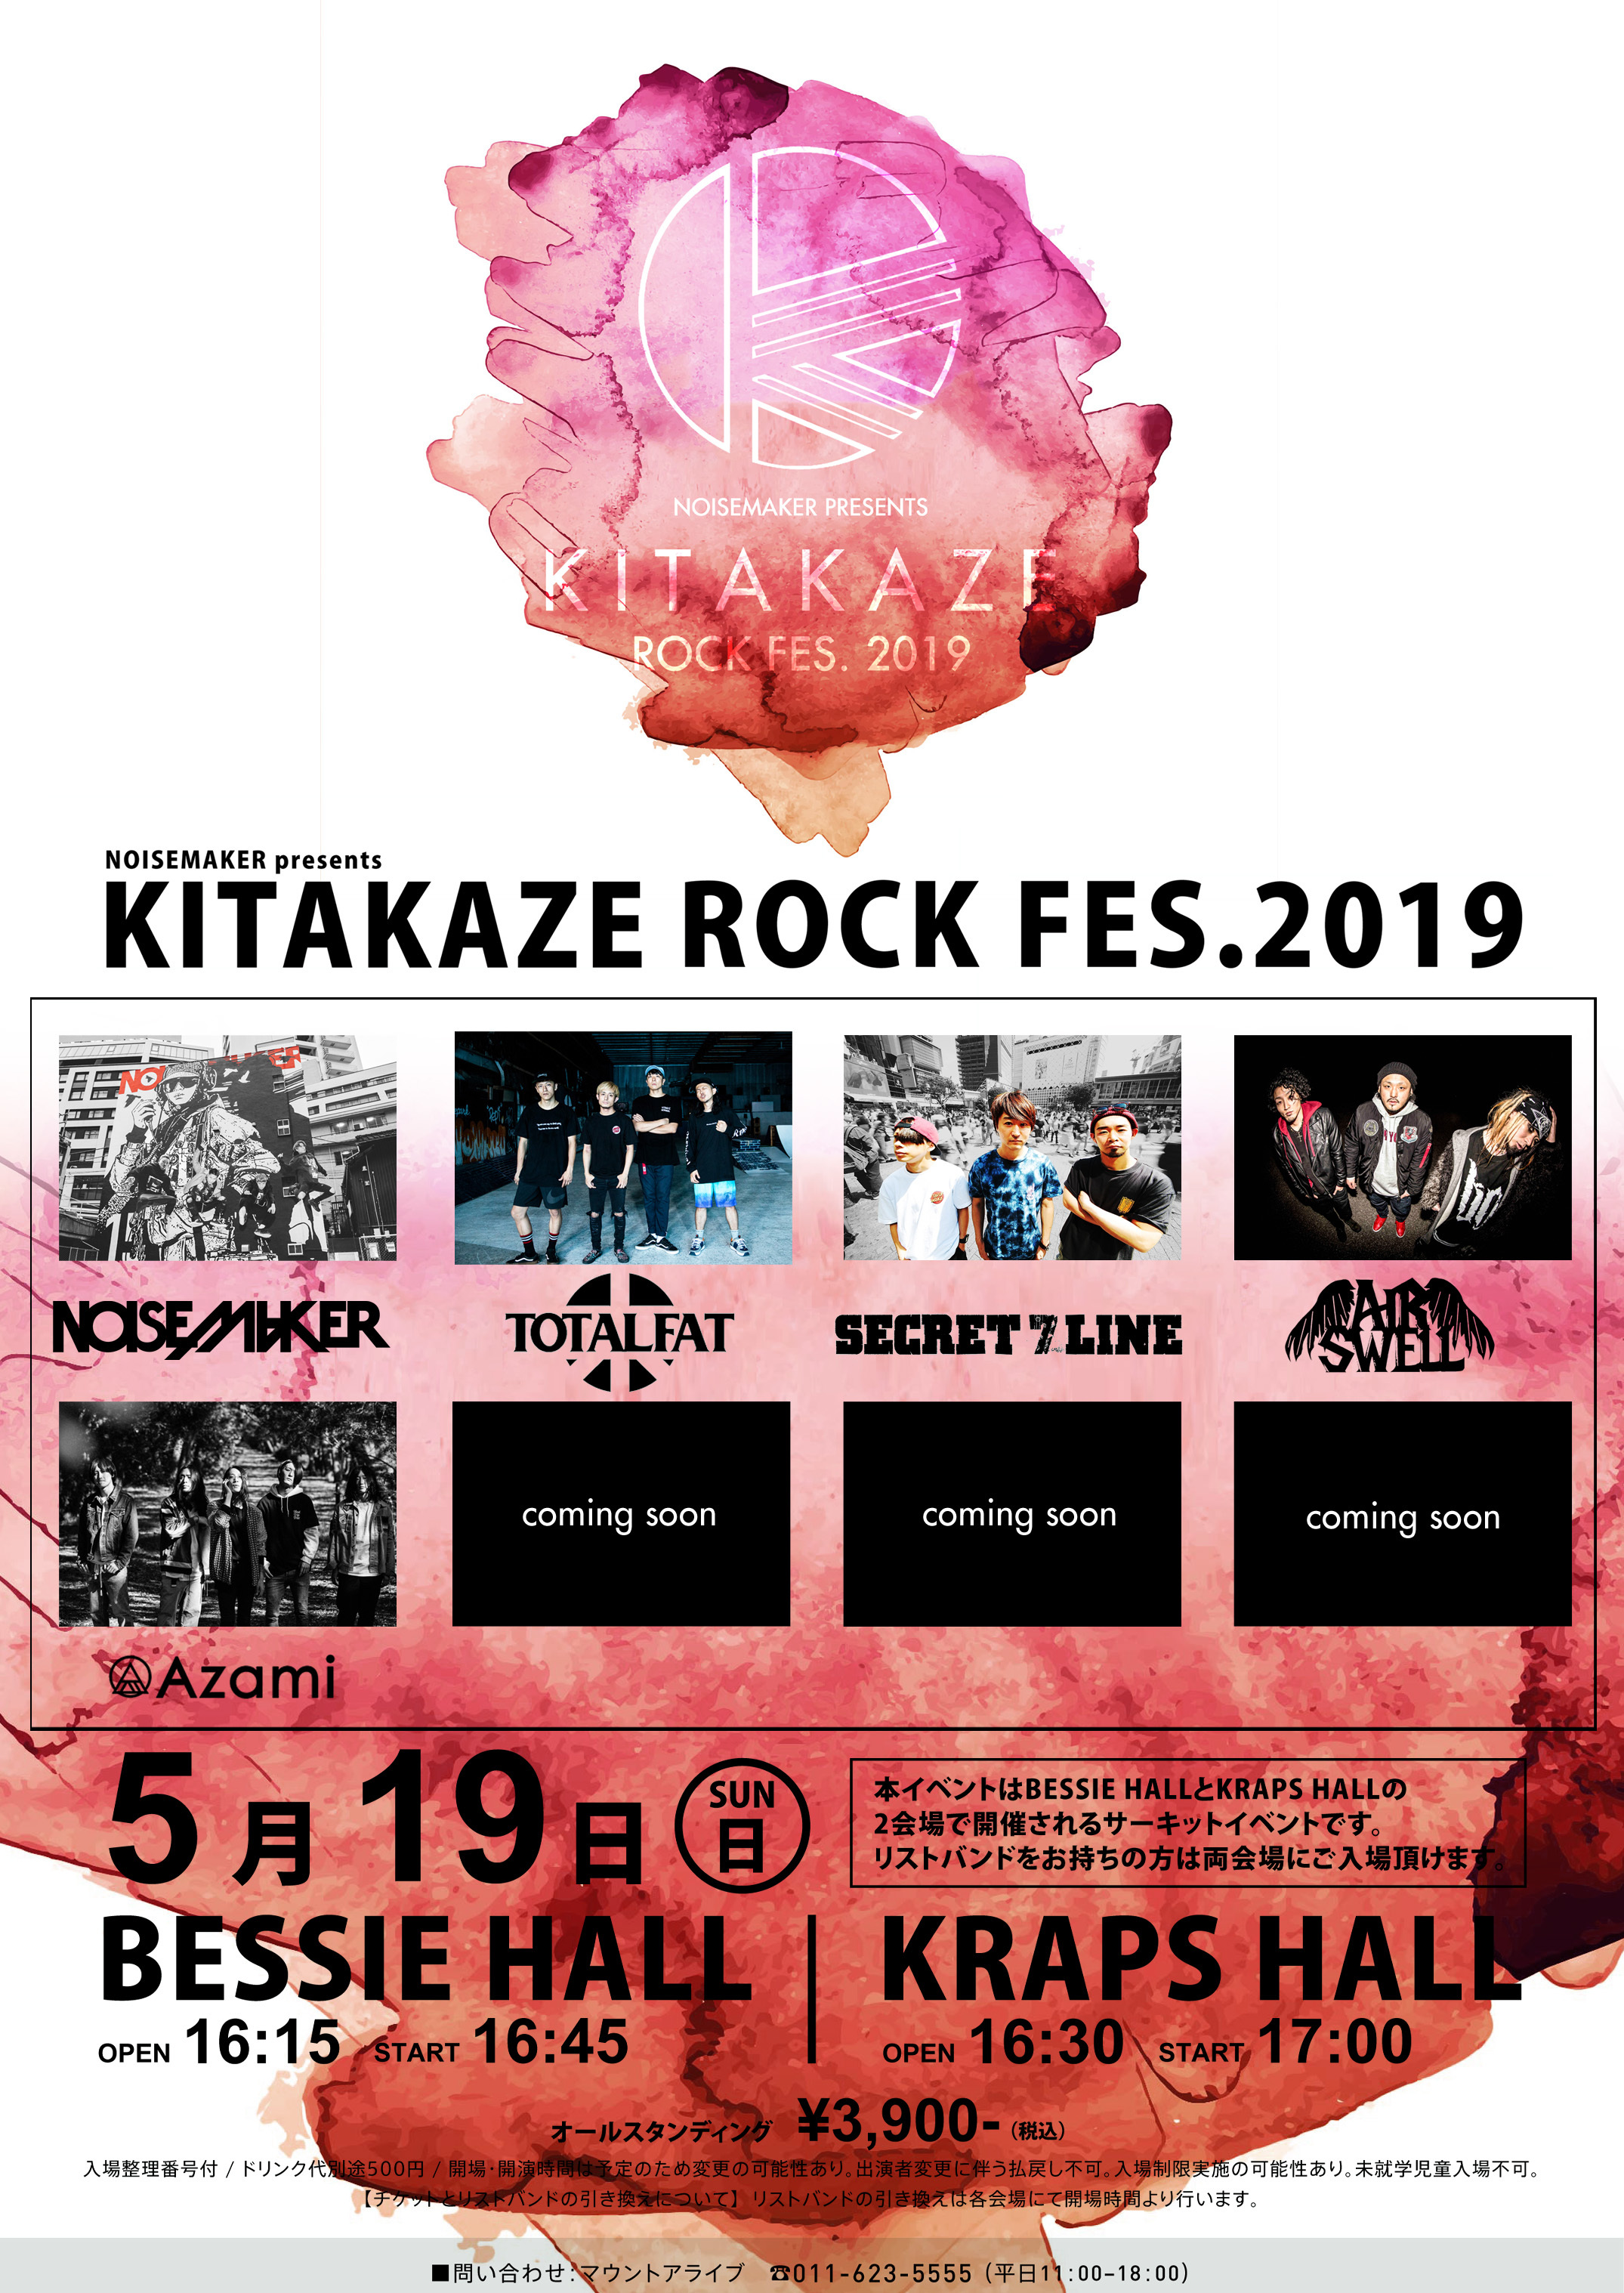 KITAKAZE ROCK FES 2019